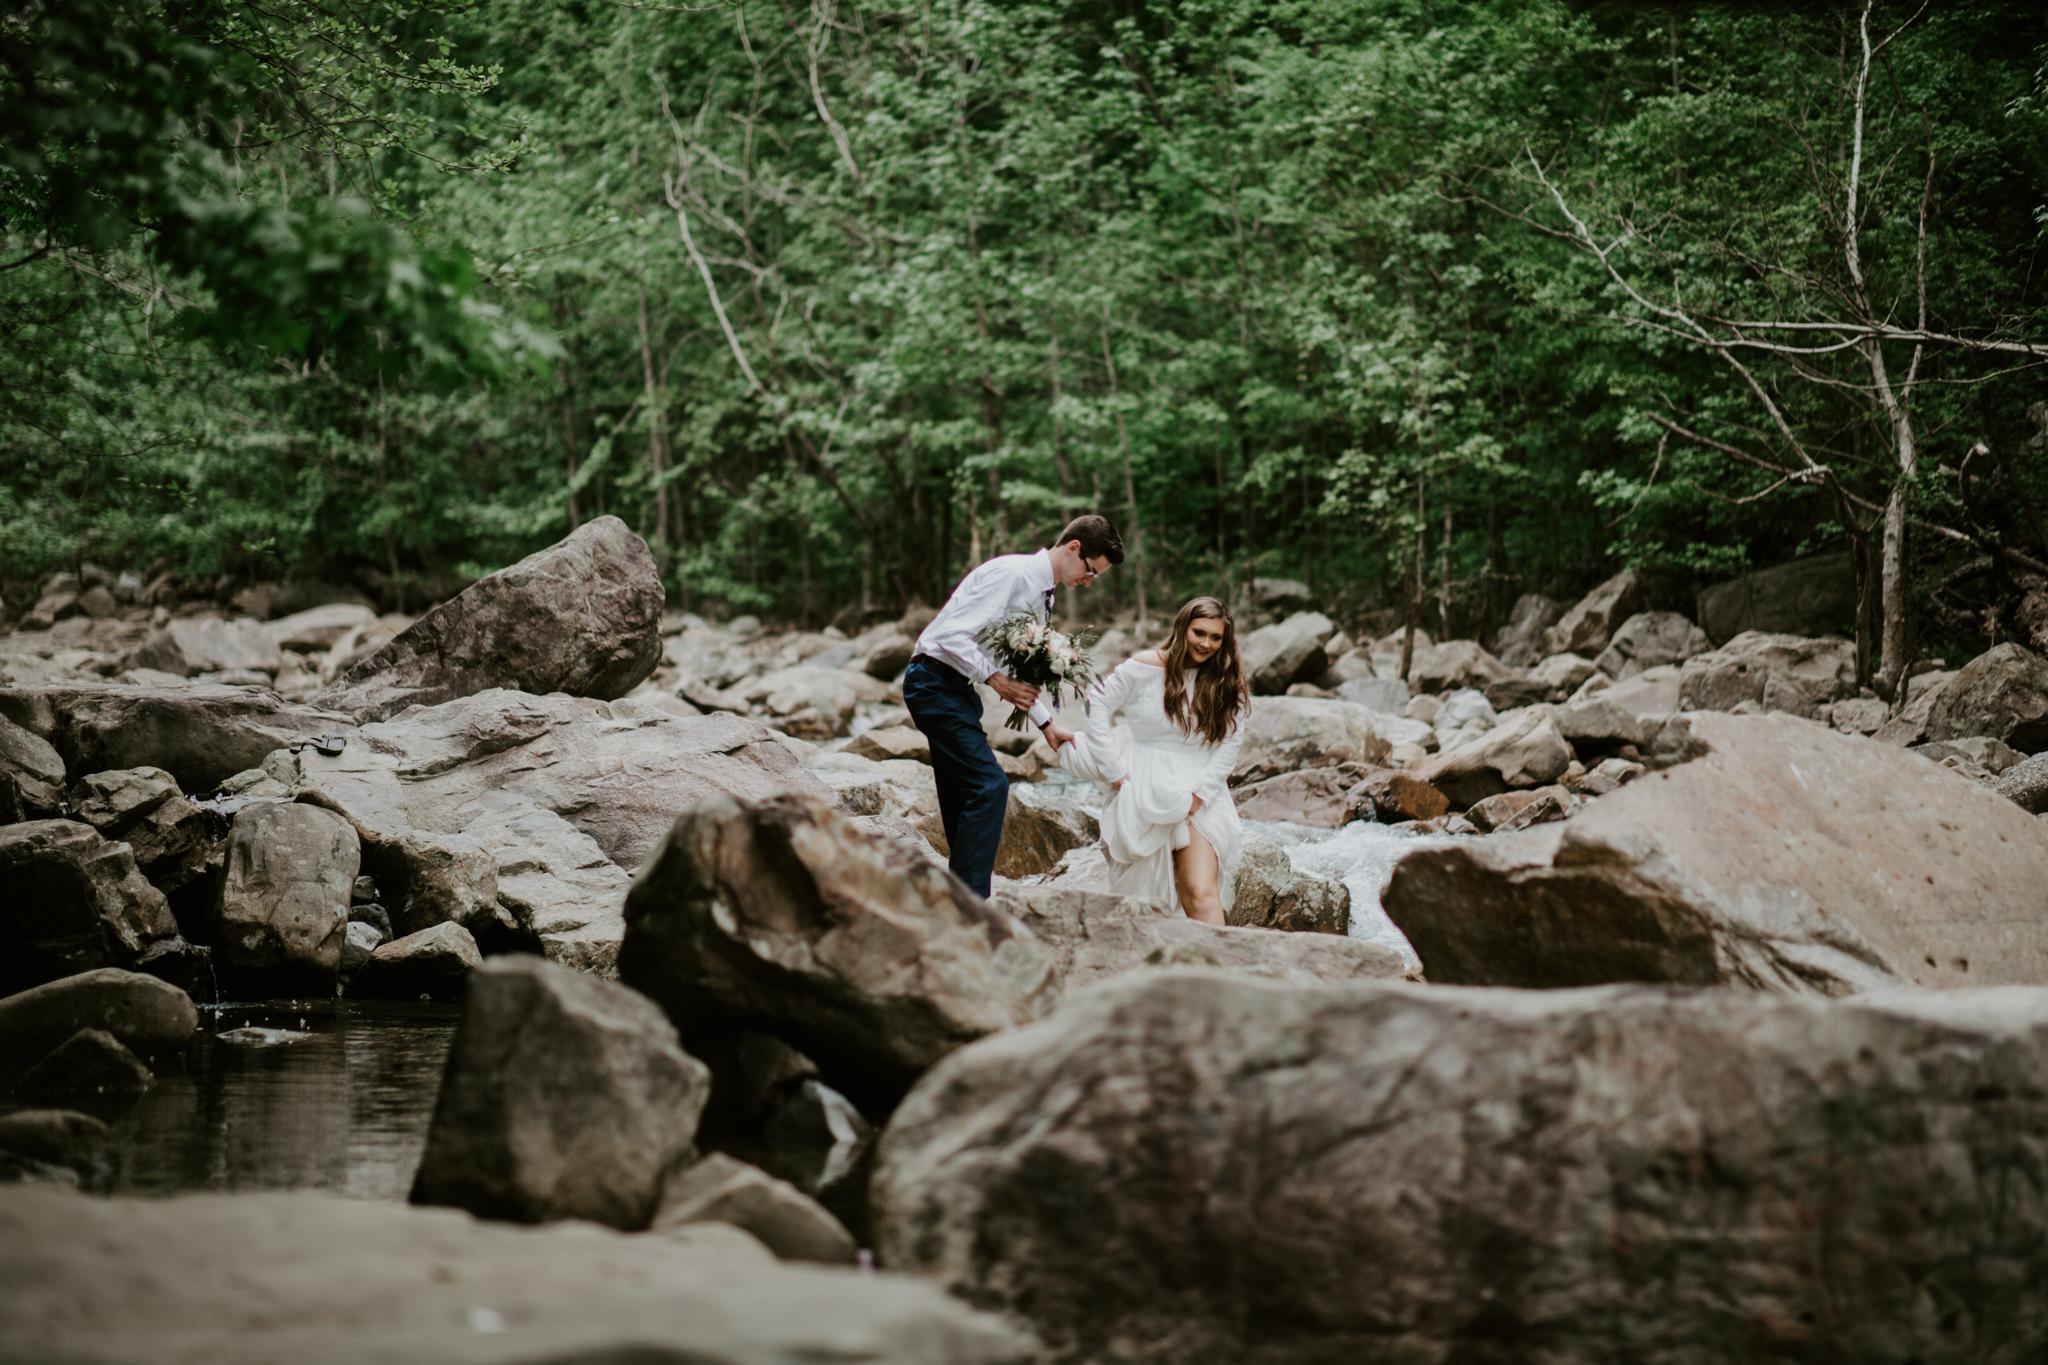 Lacey-Joe-Chattanooga-Nashville-Tennessee-Wedding-Elopement-Photographer-200.jpg